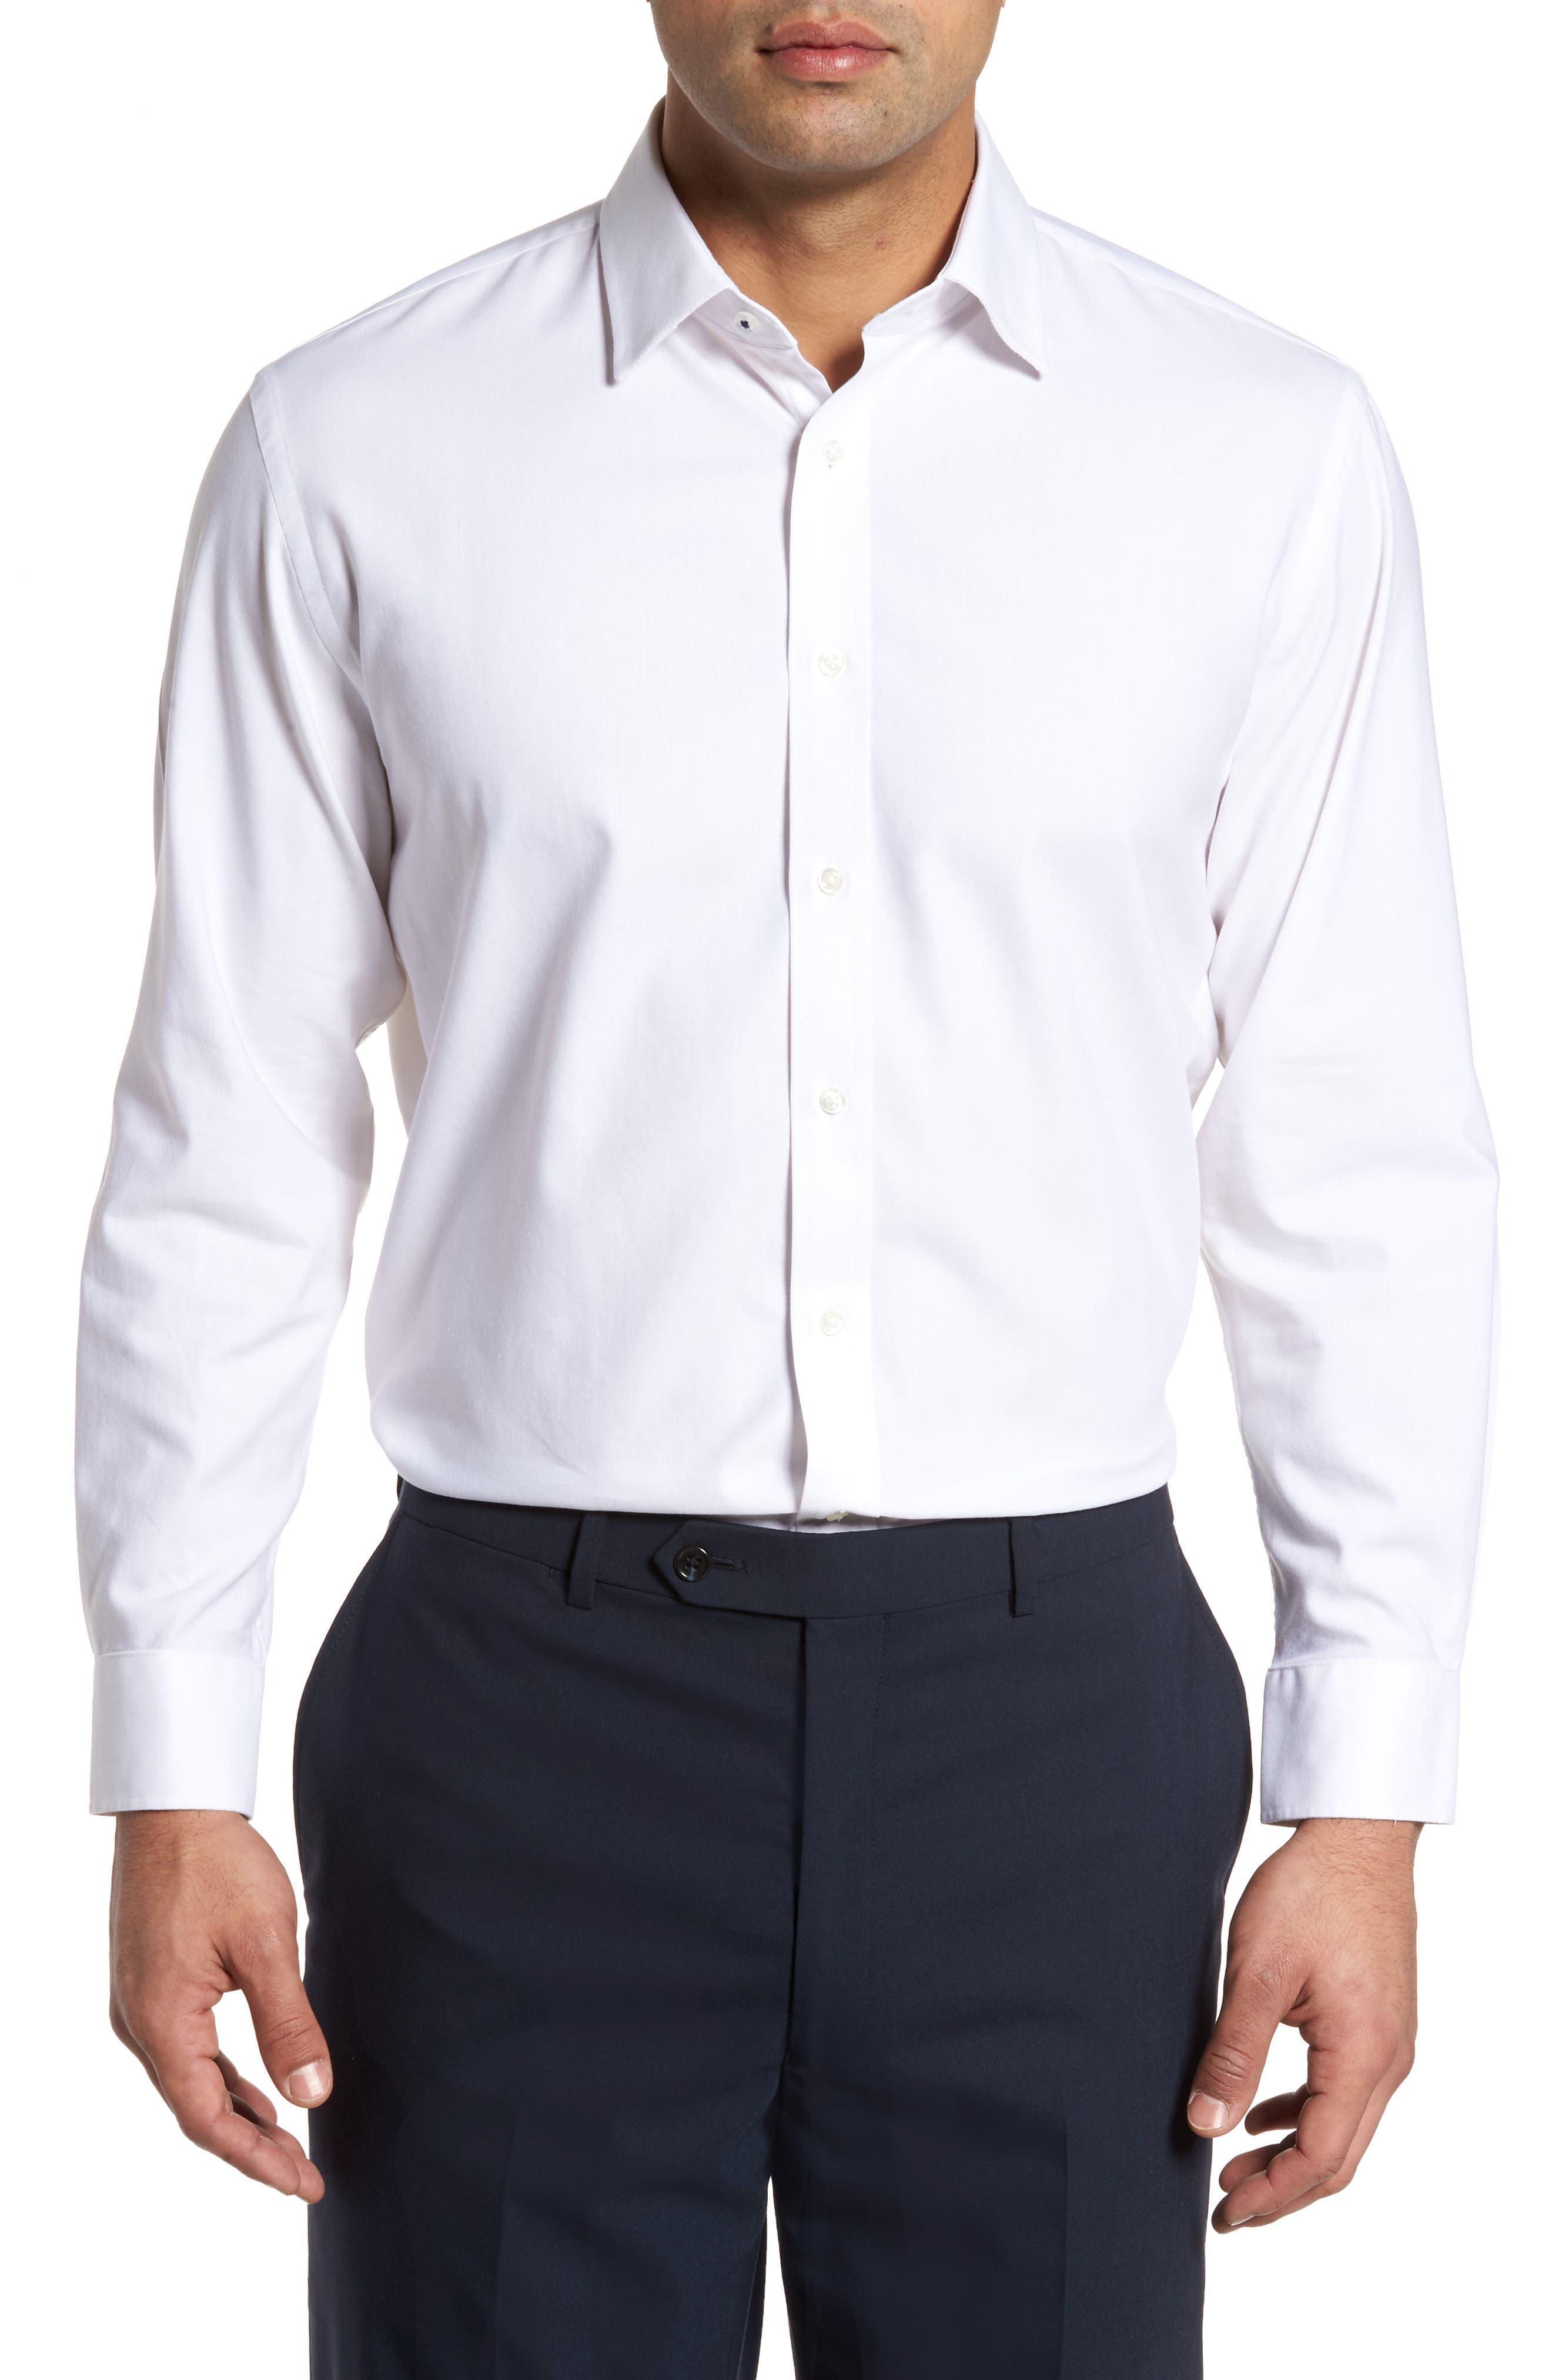 Main Image - Nordstrom Men's Shop Tech-Smart Traditional Fit Solid Dress Shirt (3 for $150)